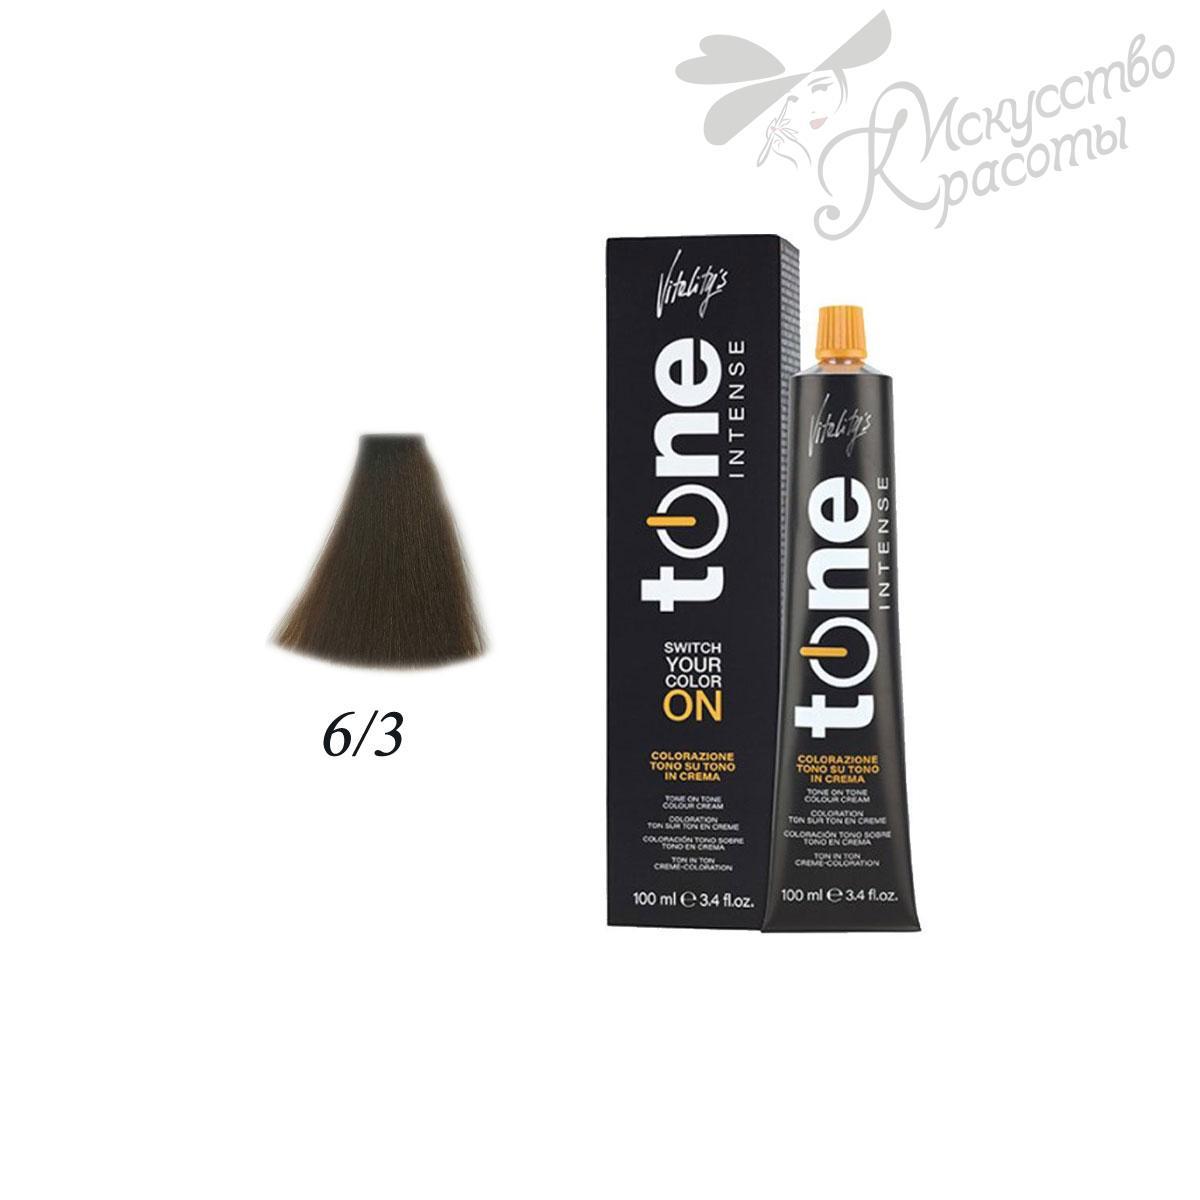 Краска для волос 6/3 золотистый темный блонд Tone Intense Vitality's 100мл